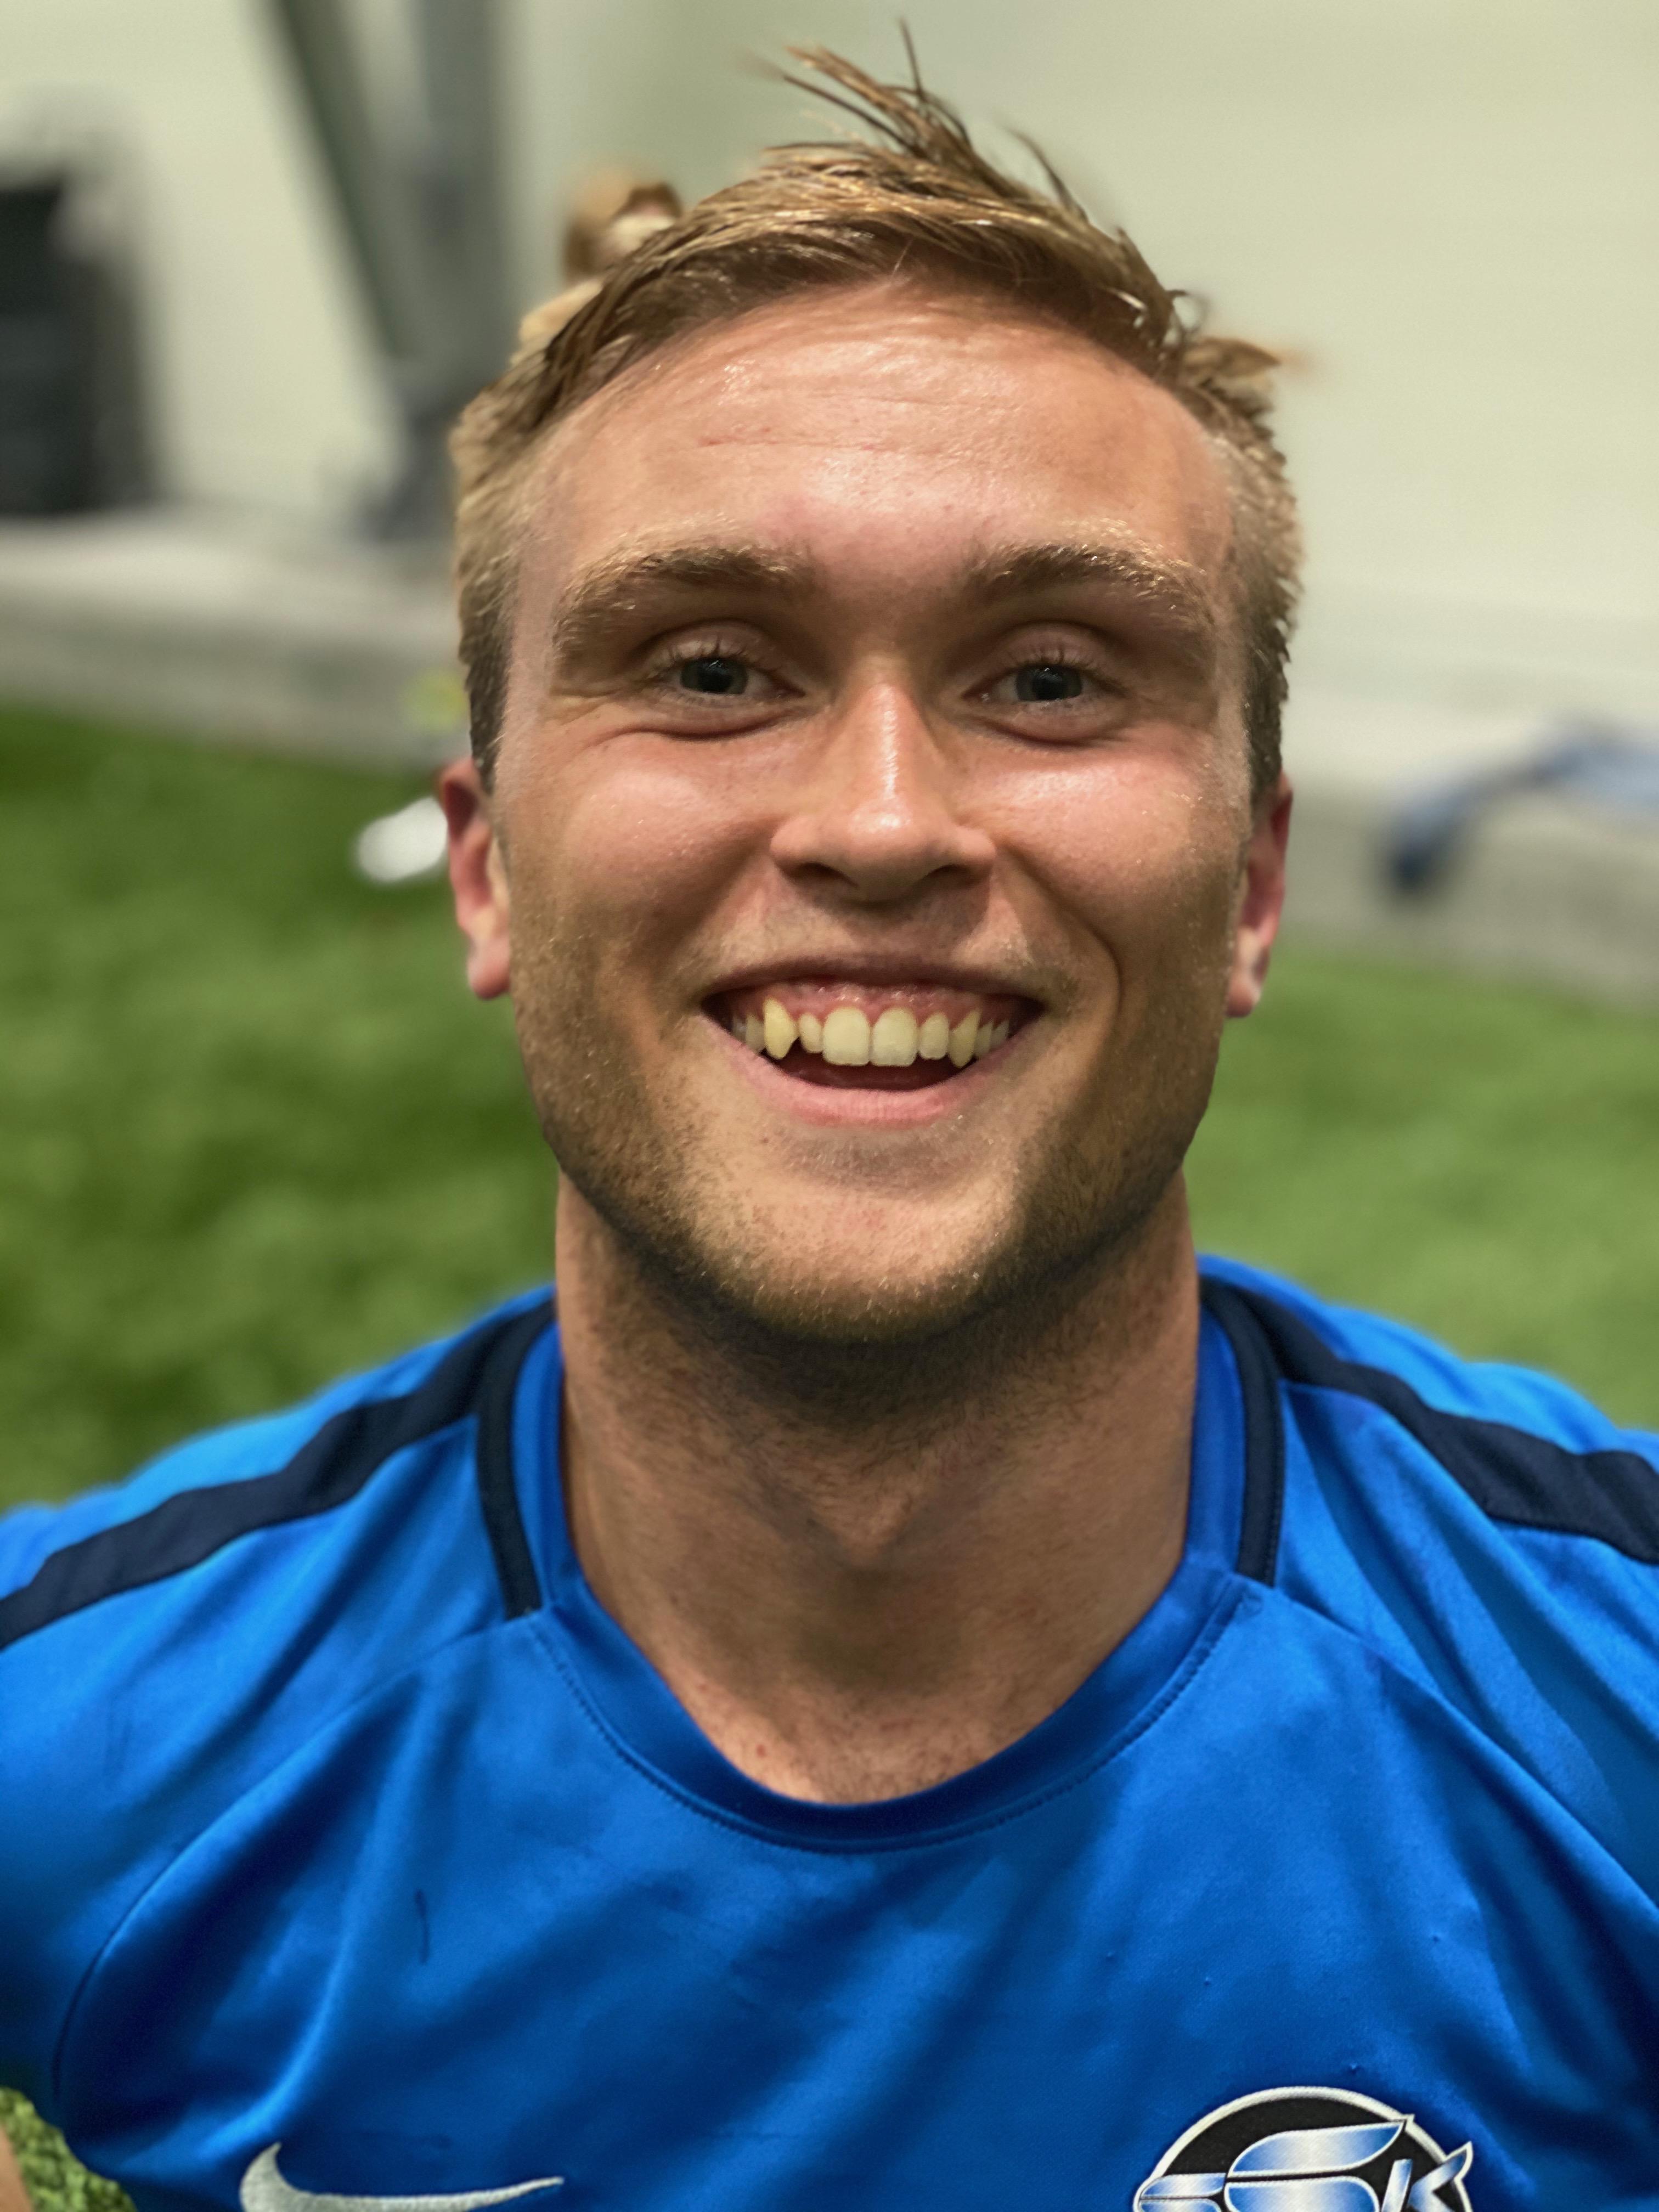 Thor-Olav Moe